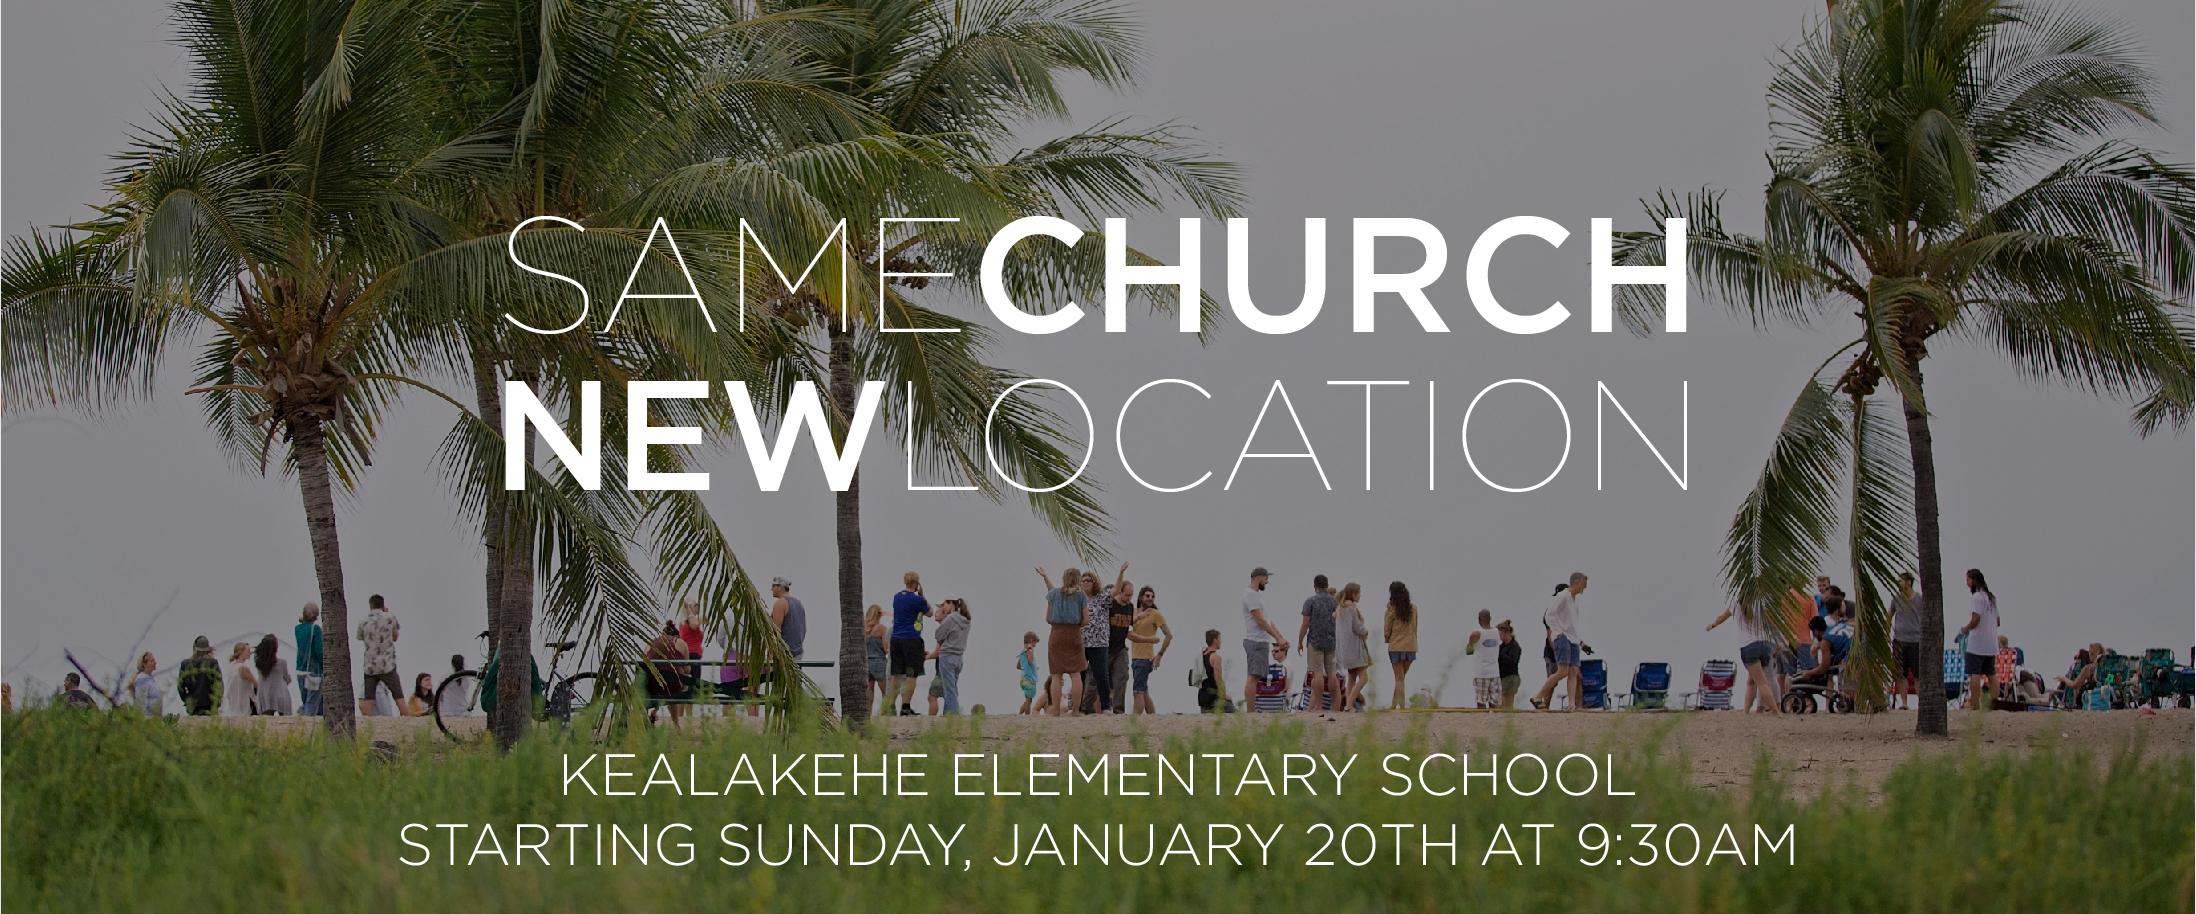 Kealakehe Elementary School, 74-5118 Kealakaa St, Kailua-Kona, HI 96740